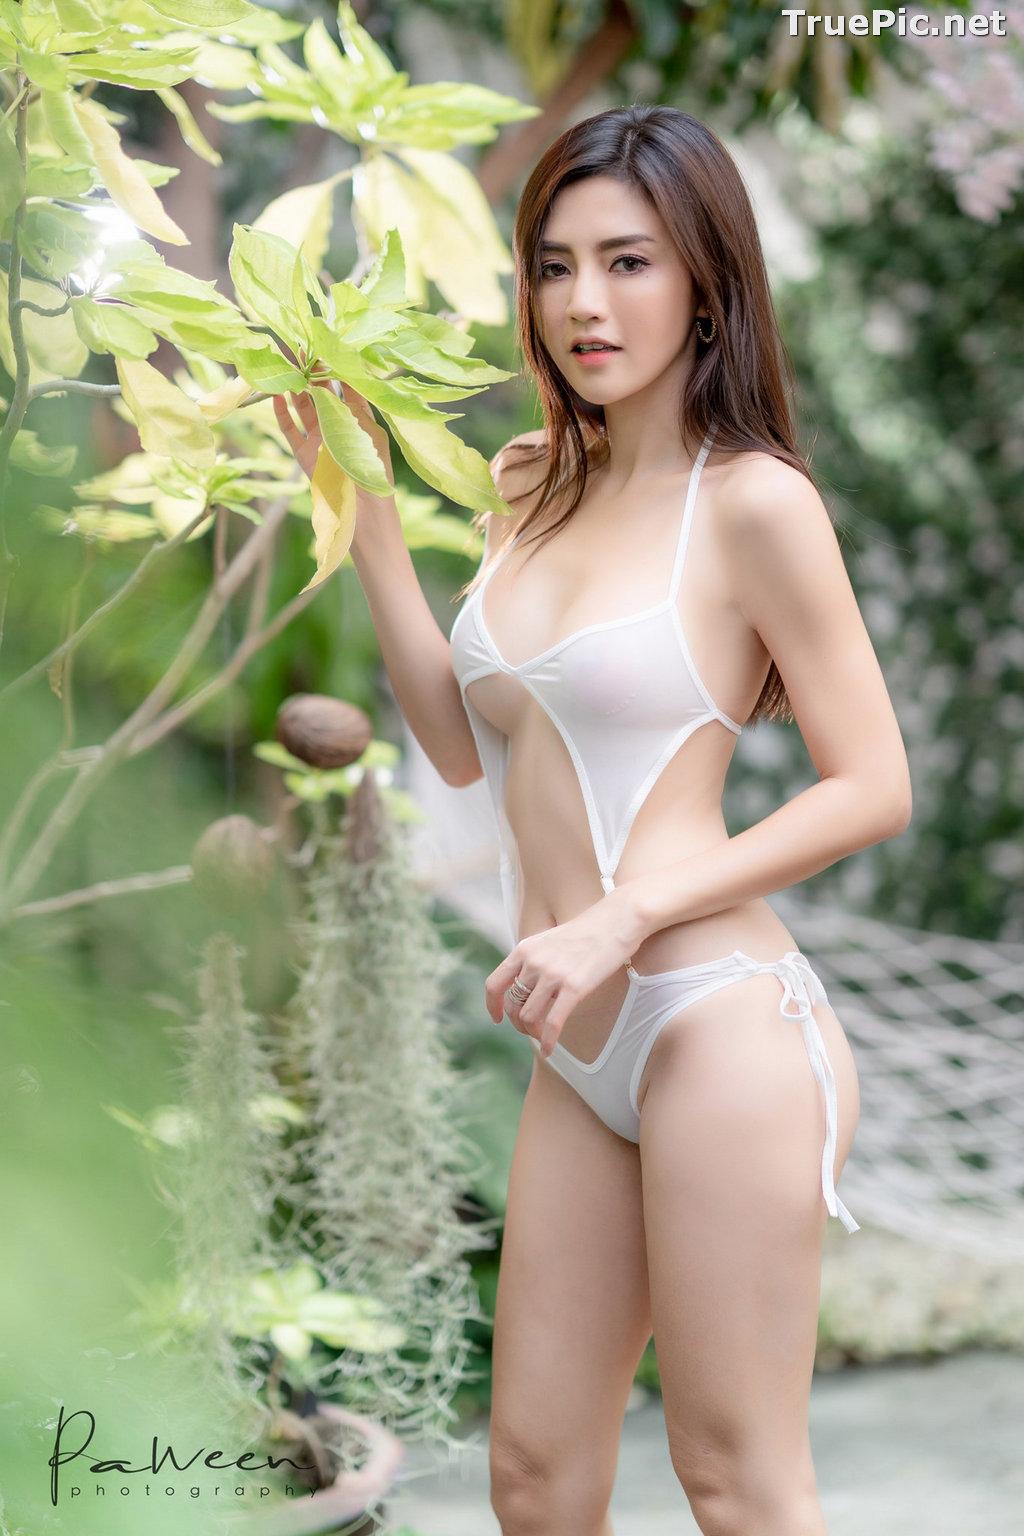 Image Thailand Model - Ladapa Ratchataamonchot - Sexy Garden - TruePic.net - Picture-9